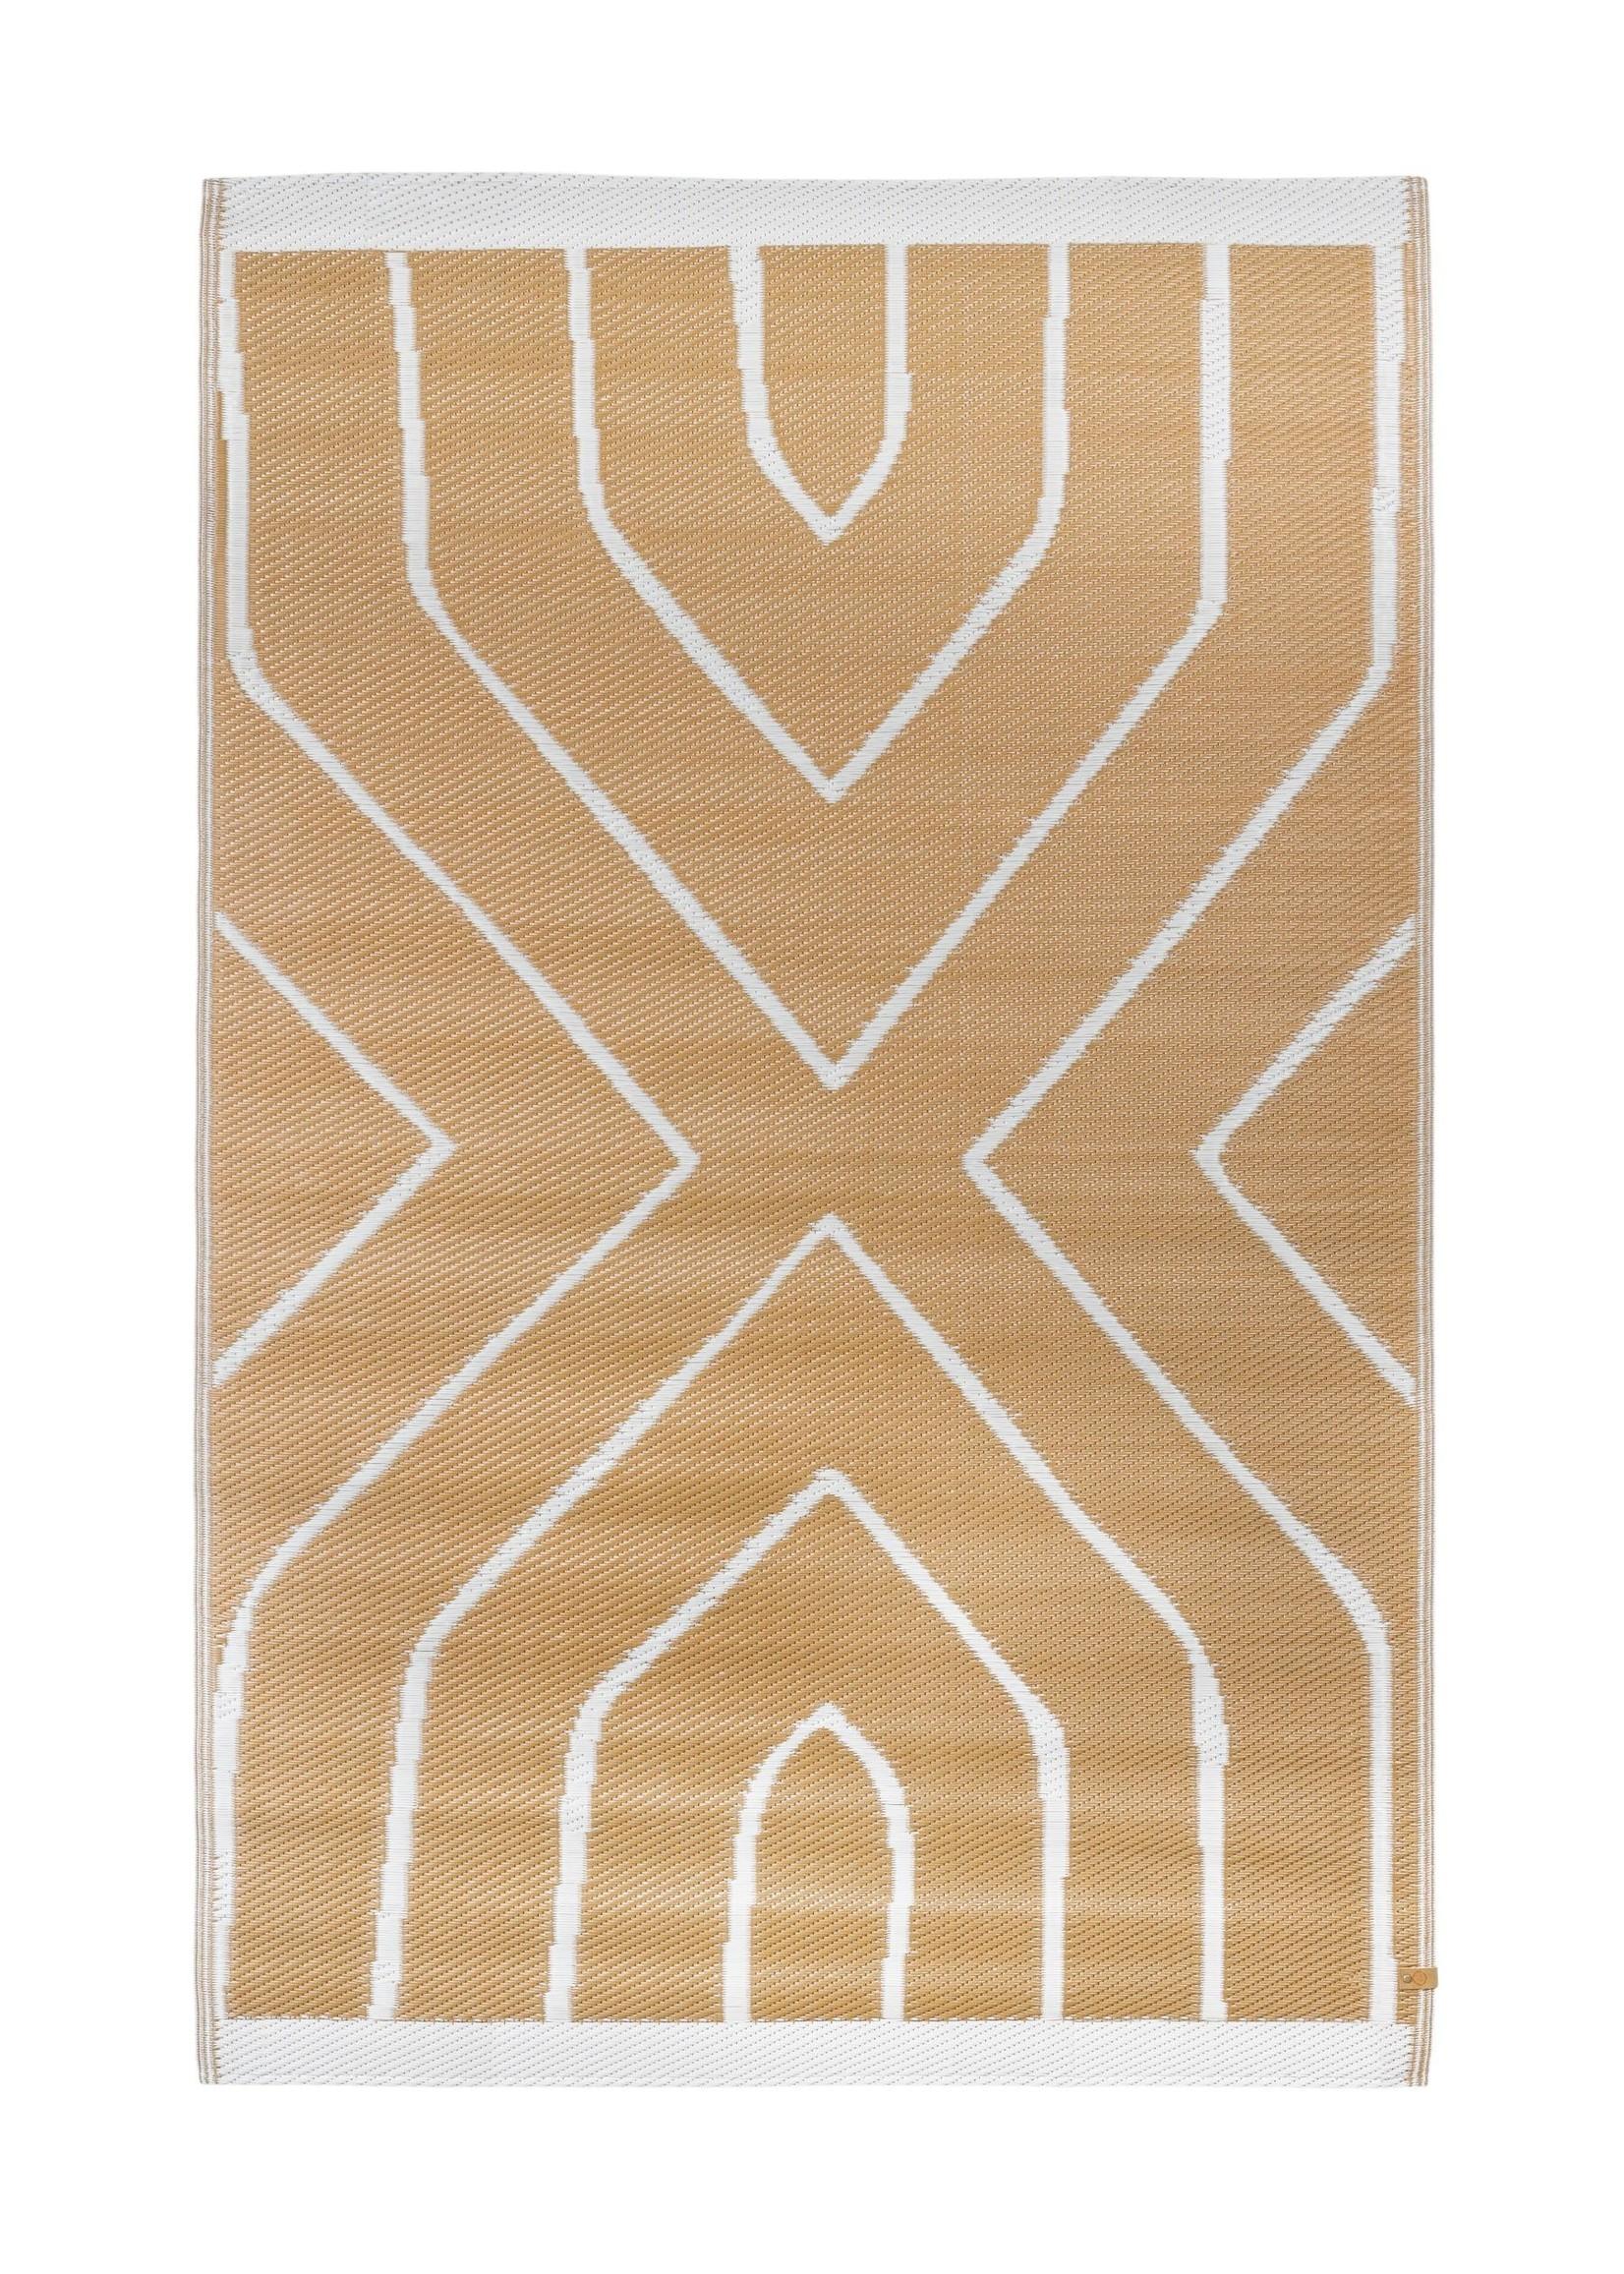 Zusss Buitenkleed grafisch patroon 120x180cm kaki